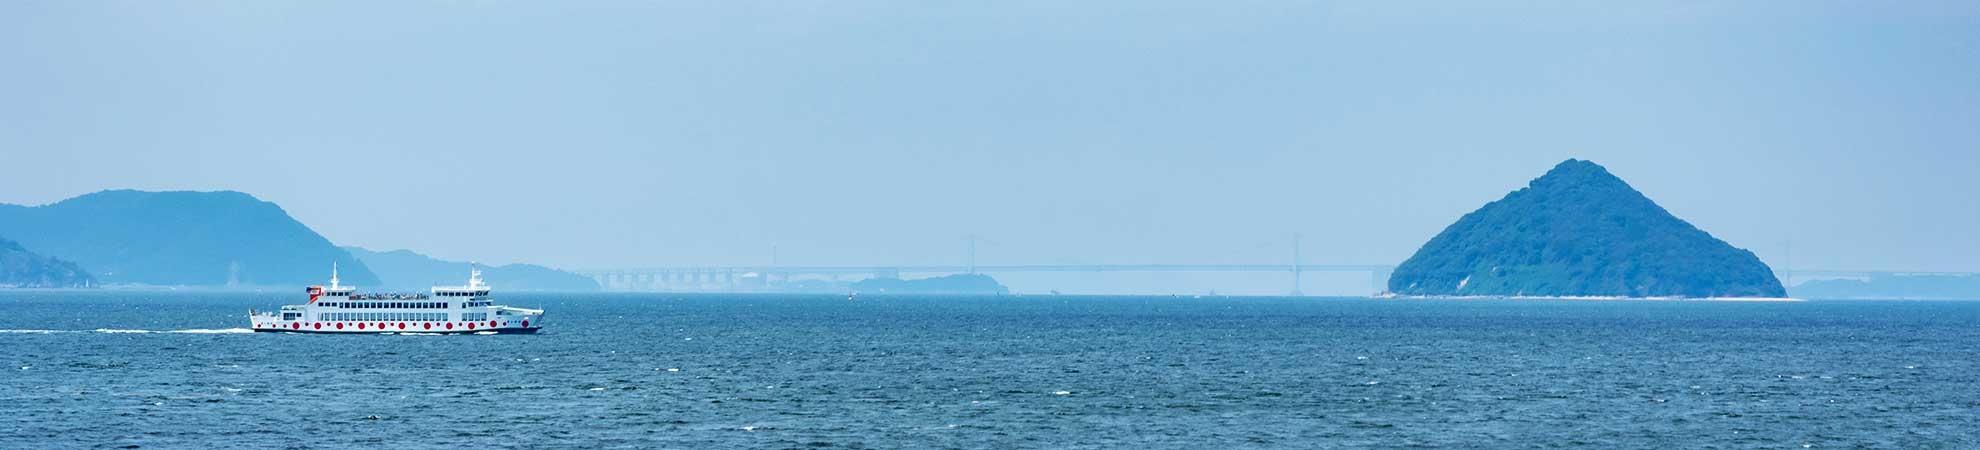 Voyage Naoshima